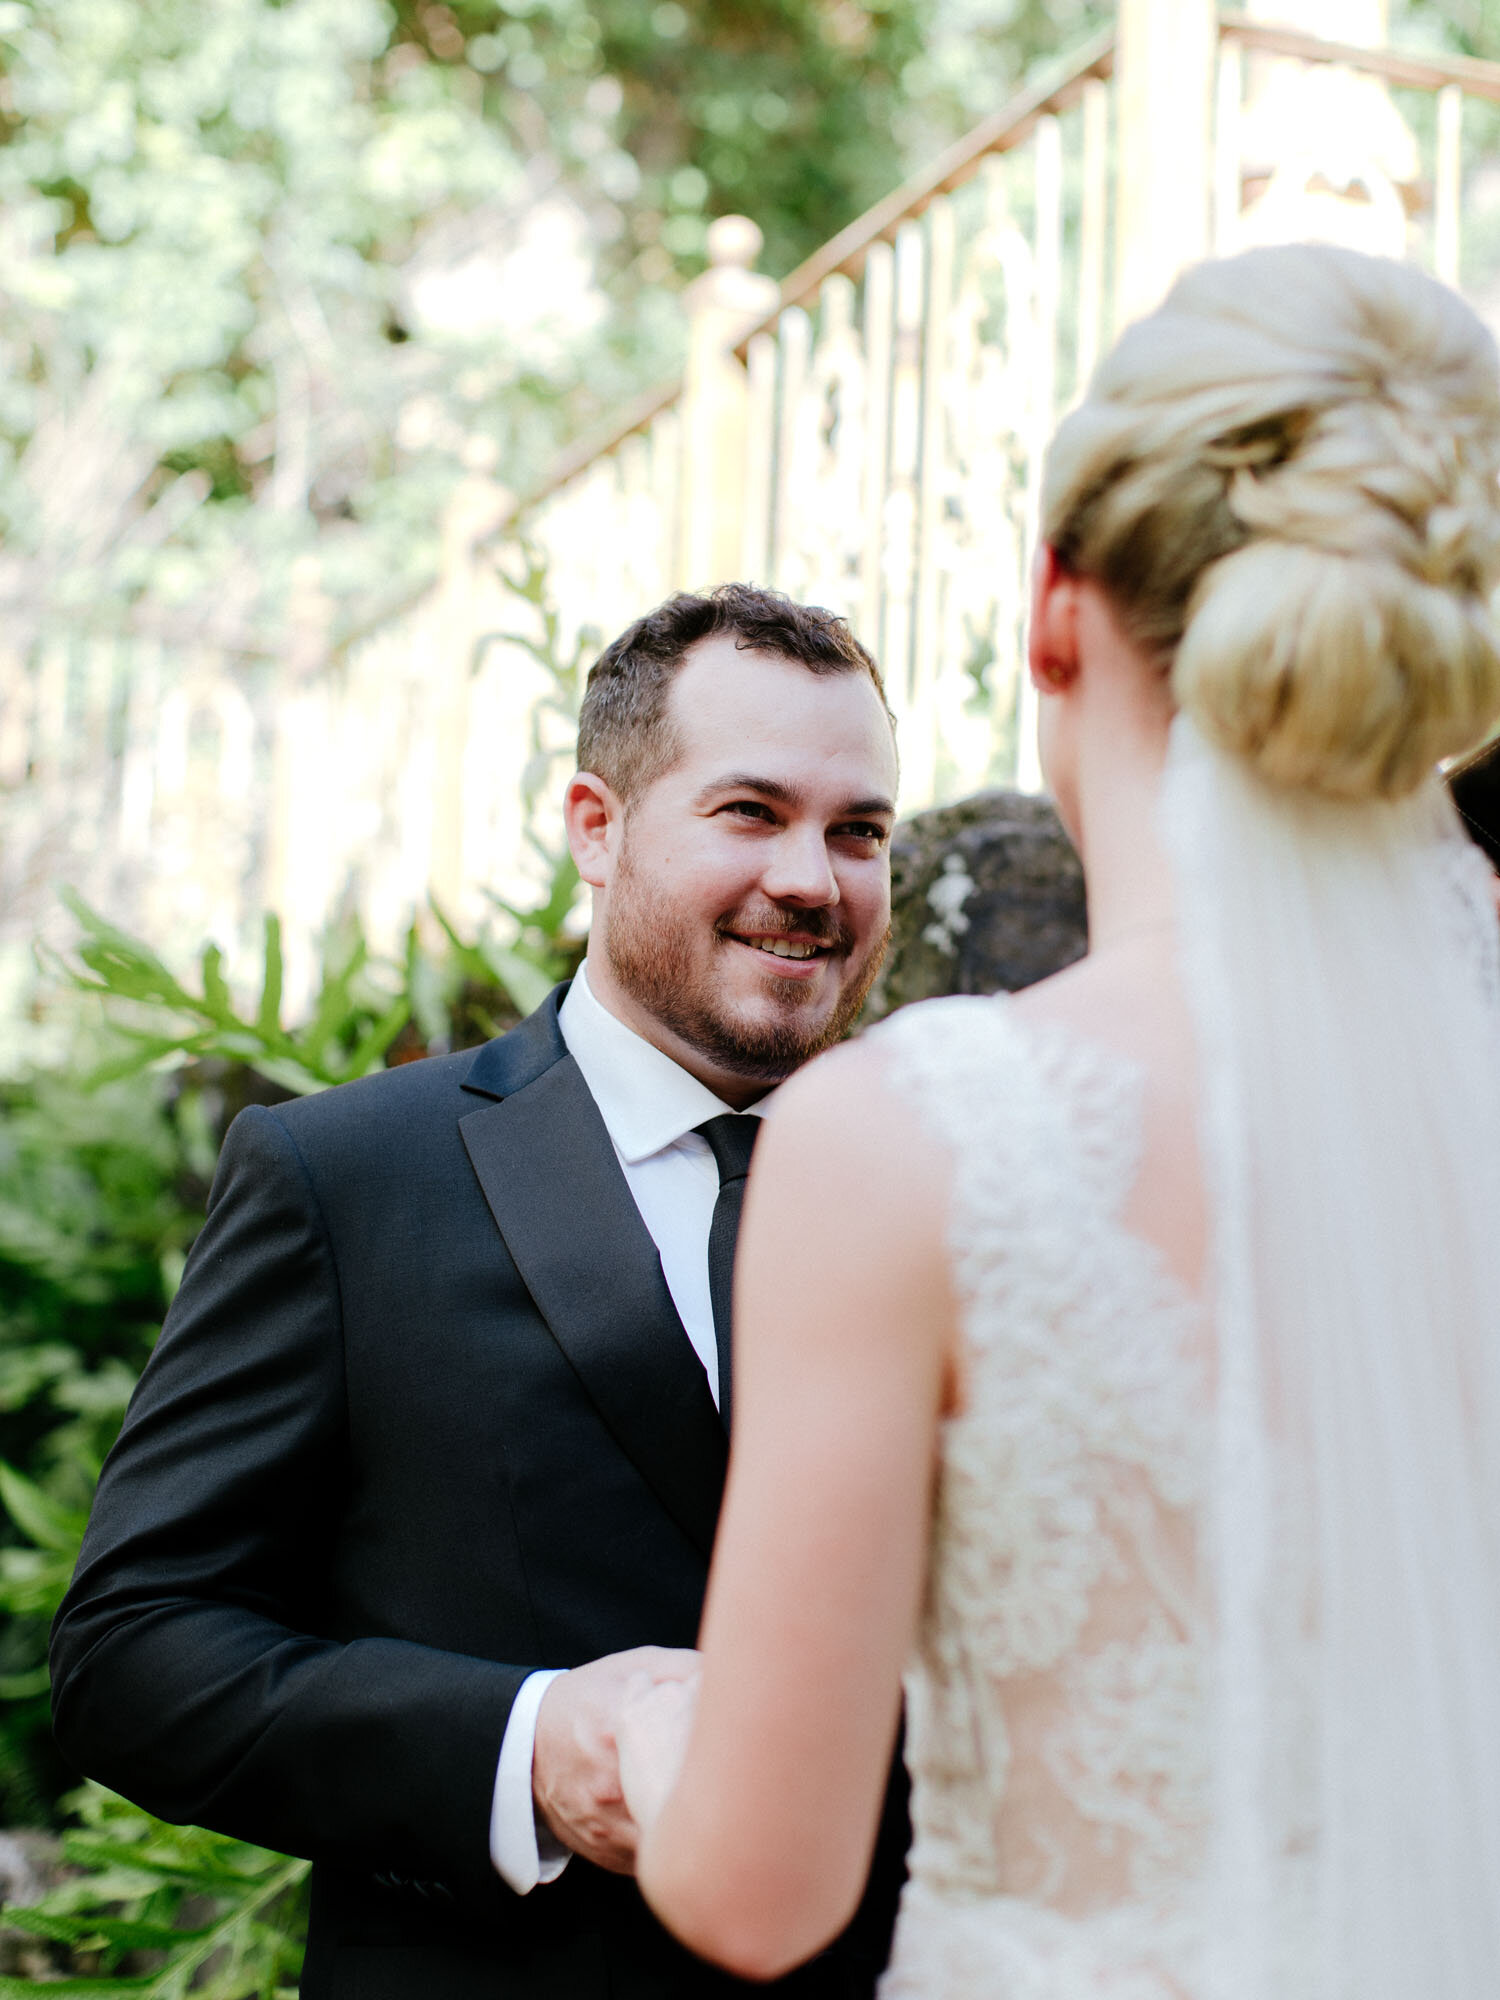 Chris-J-Evans-Maui-Wedding-Kim&Brian2481.jpg